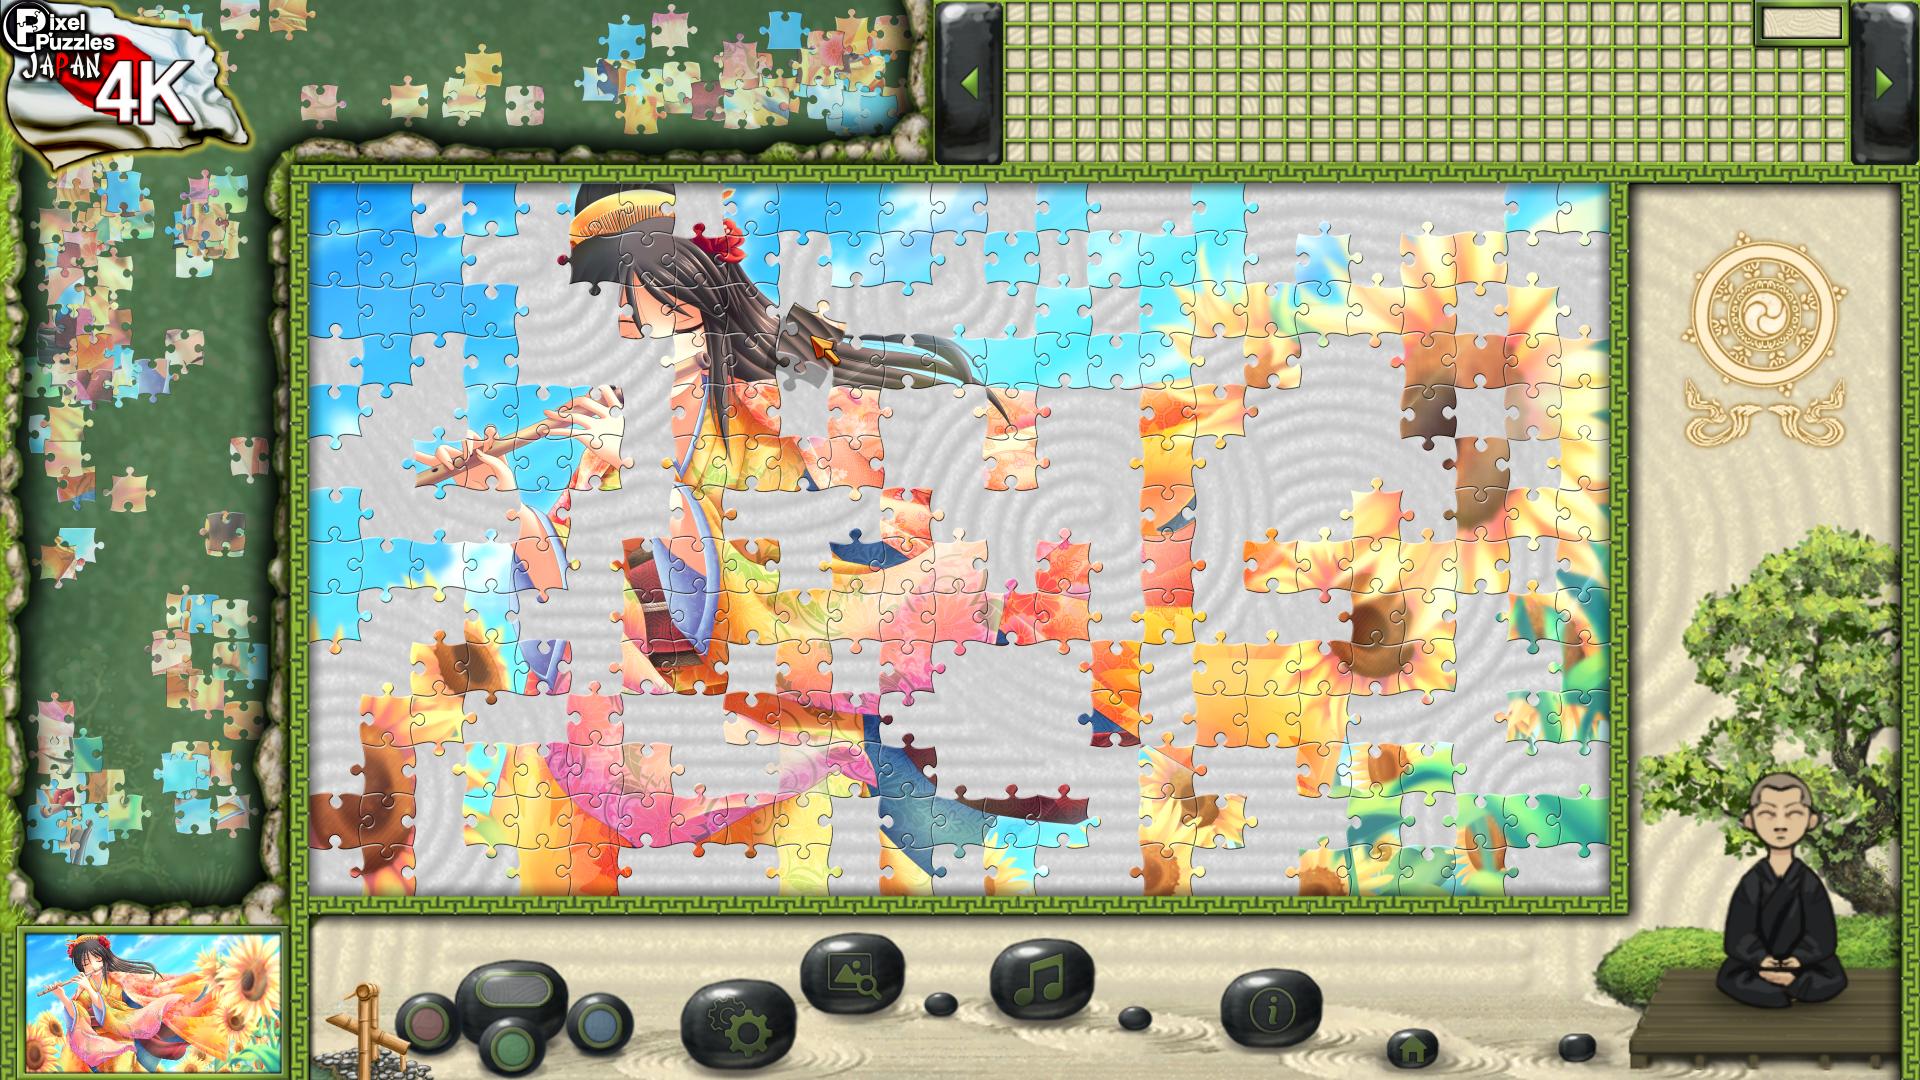 Pixel Puzzles 4k: Japan   WW (4b8129c9-3a6d-47d1-82a6-58fe9a503bc9)